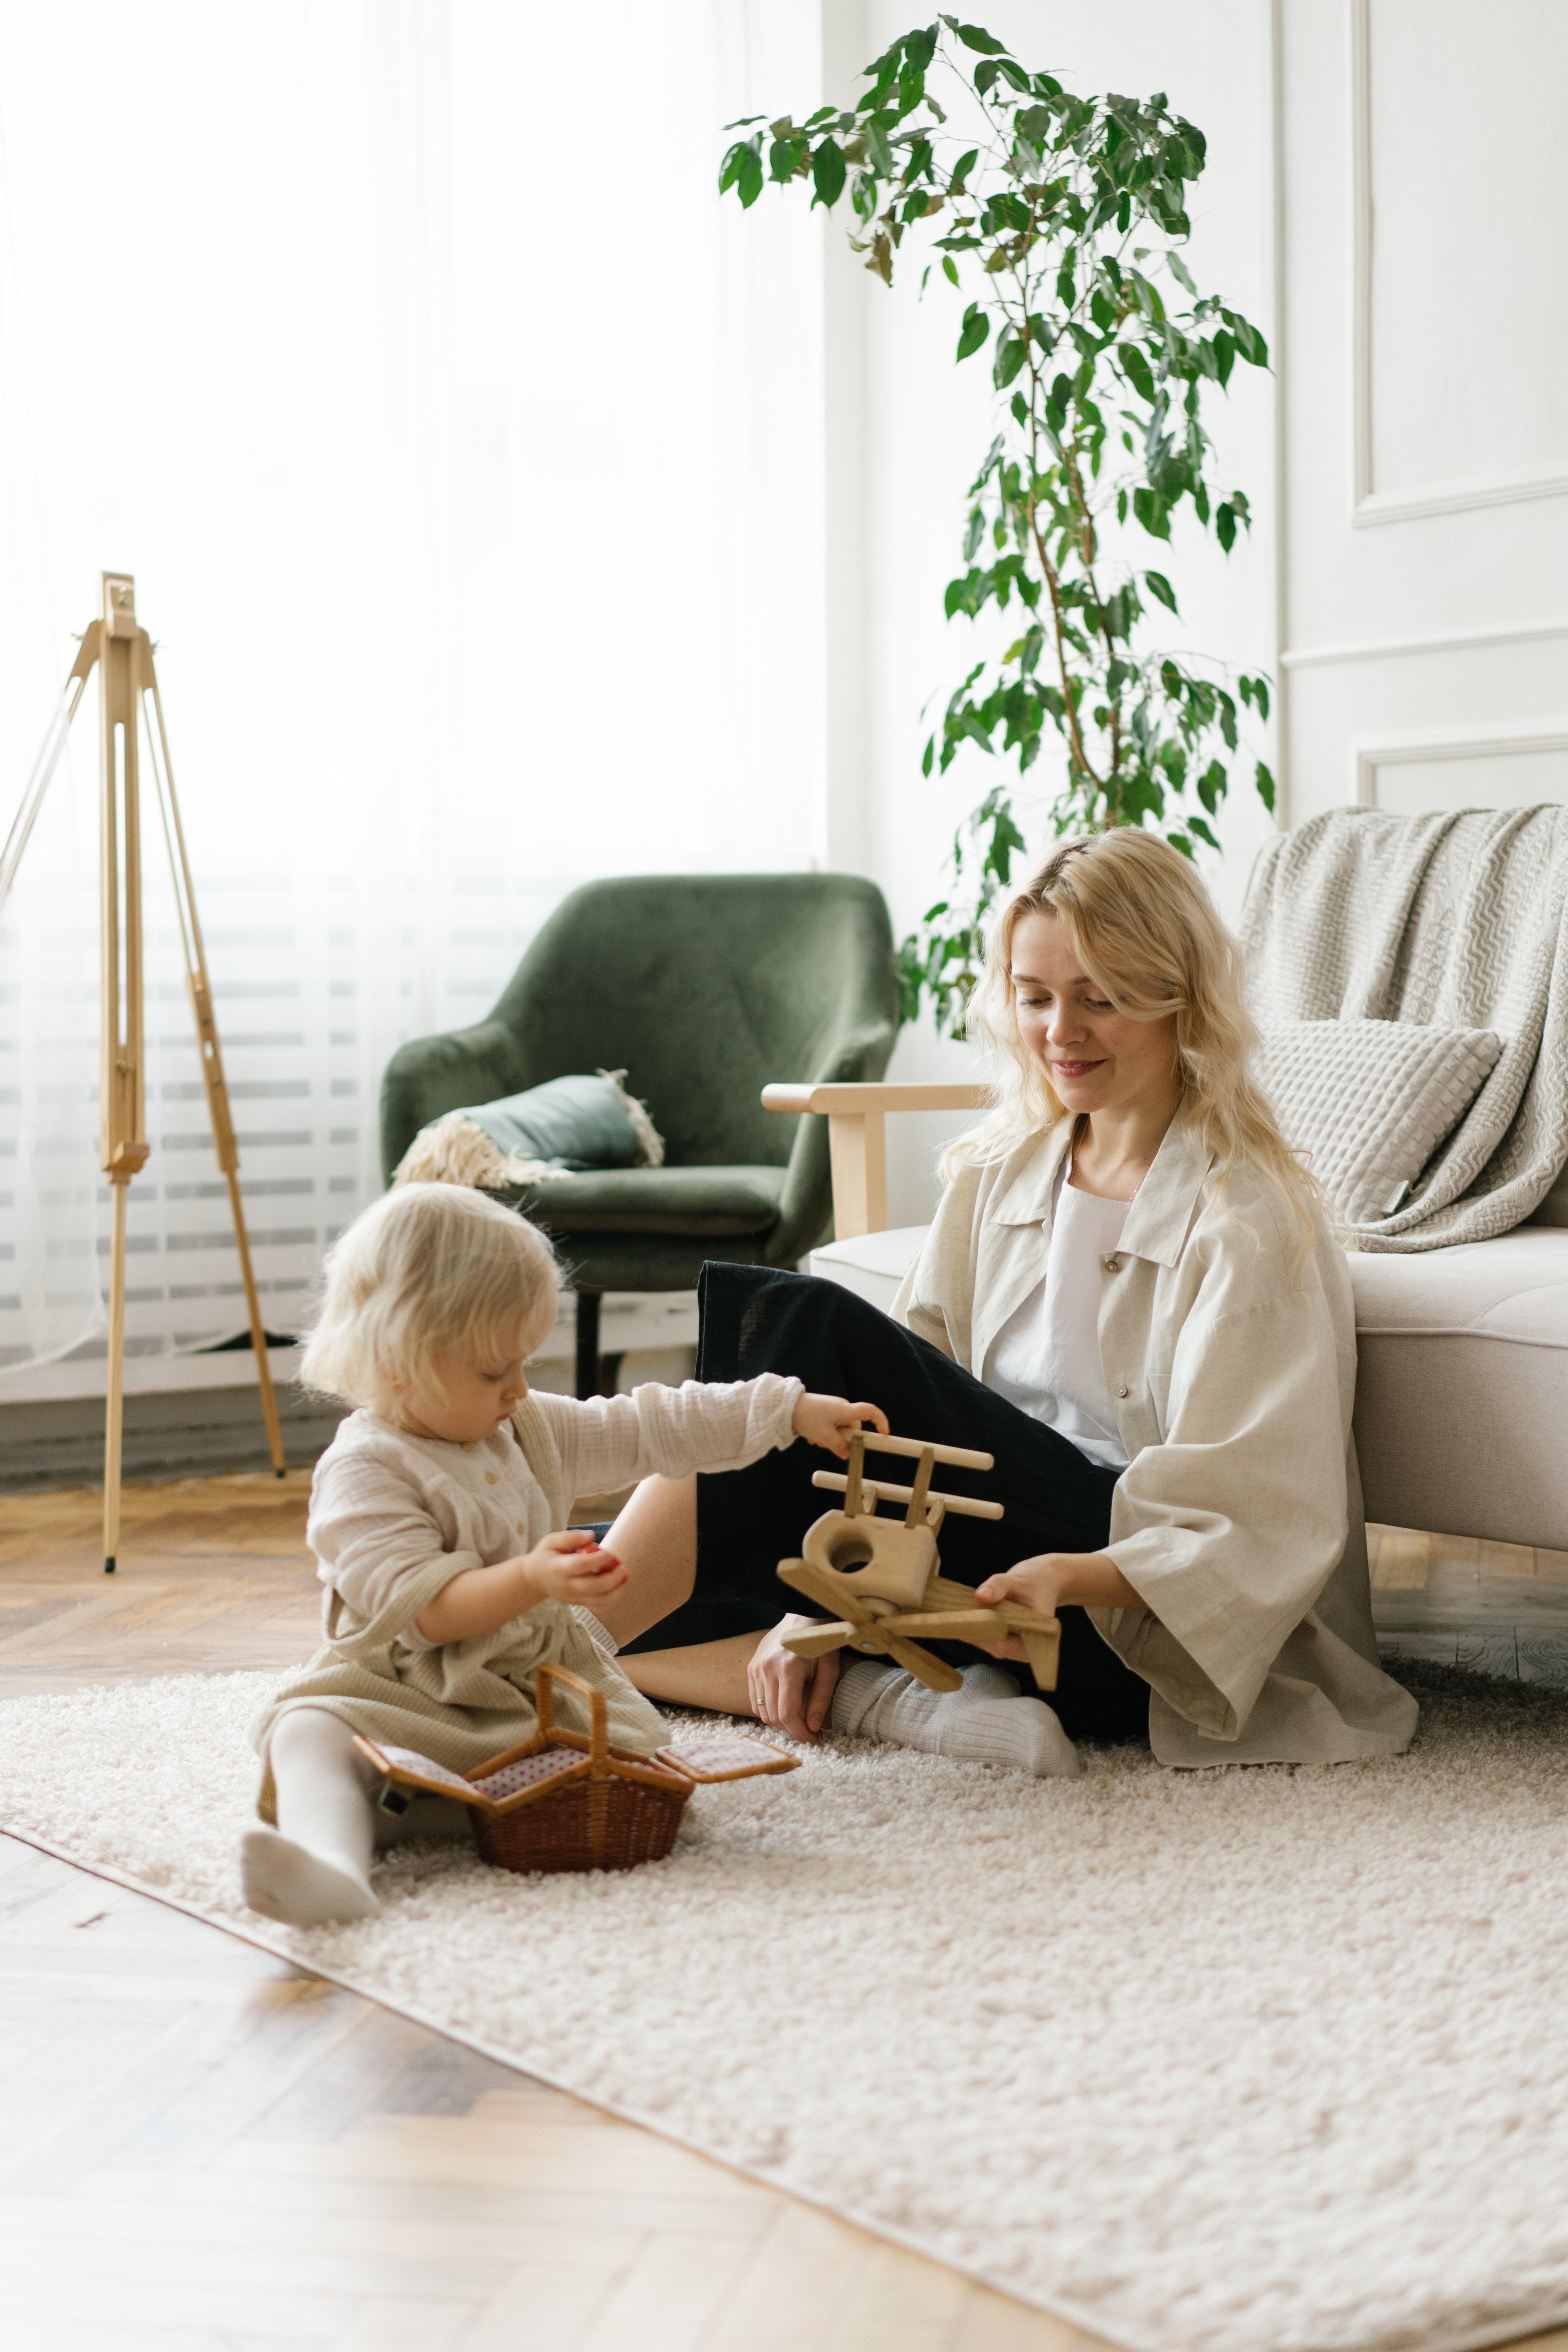 как игрушки влияют на психику ребенка